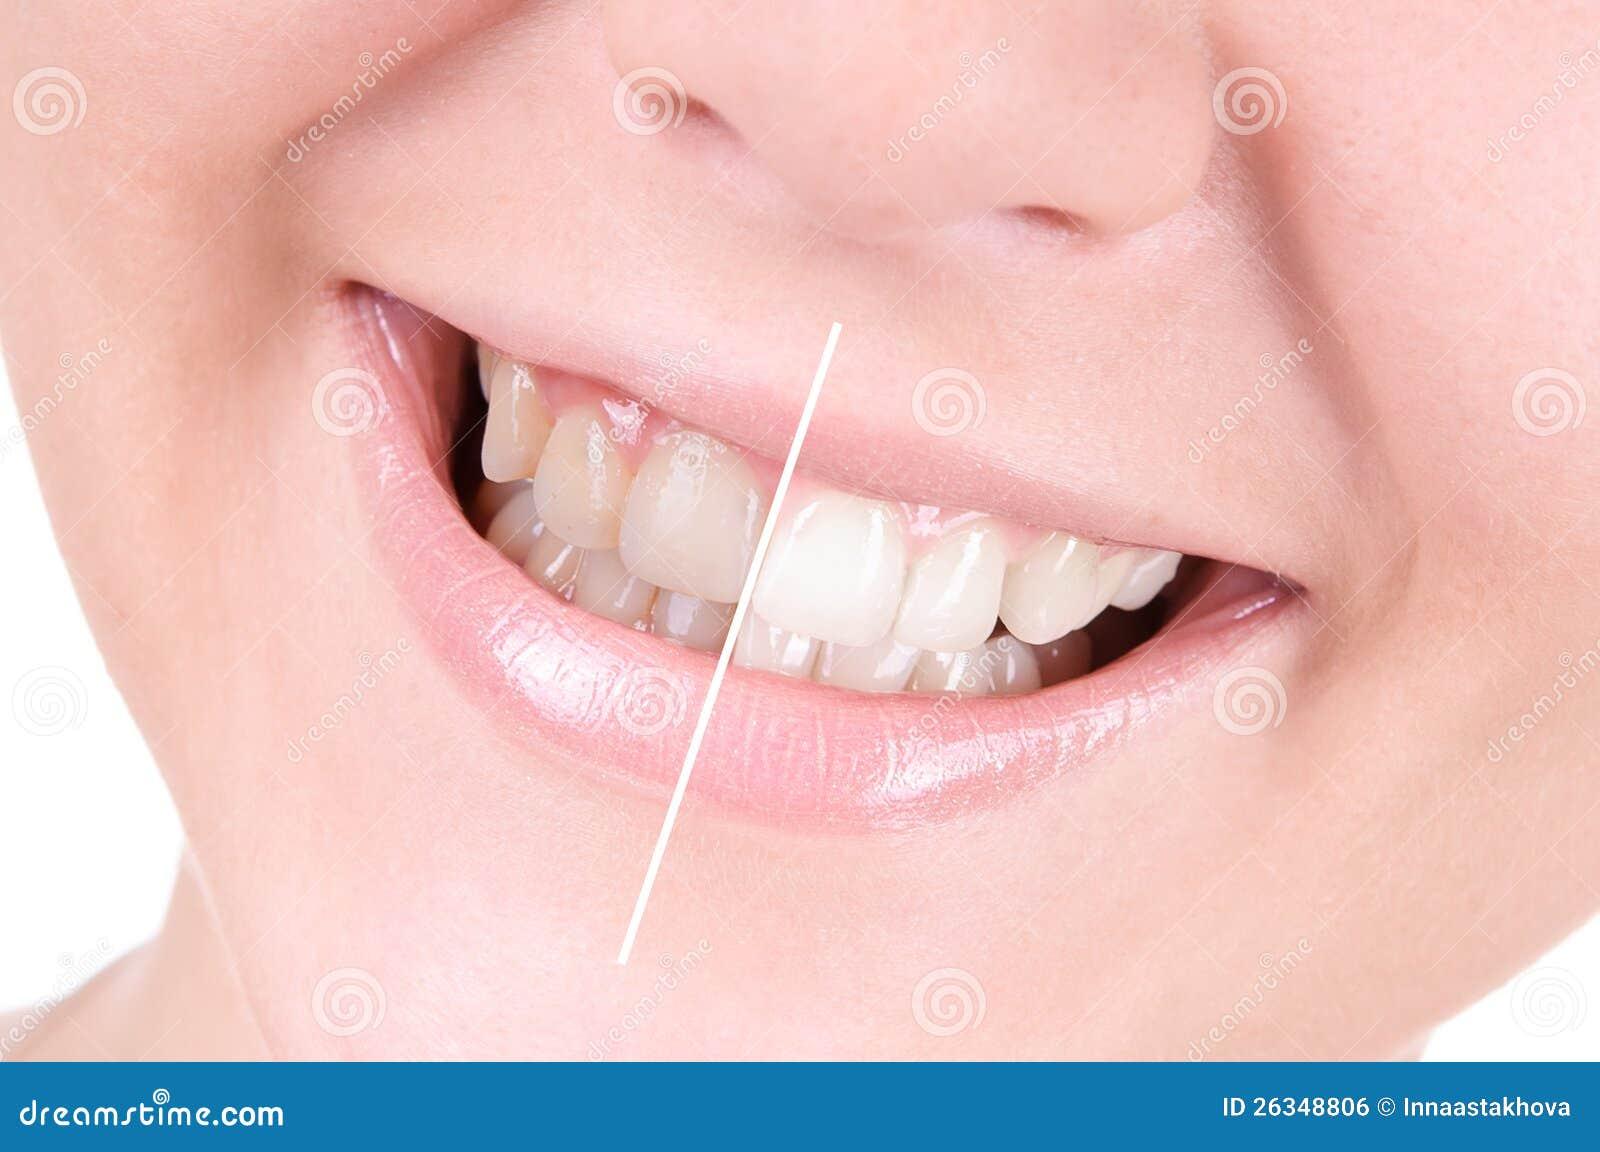 Dentes que whitening. Cuidado dental